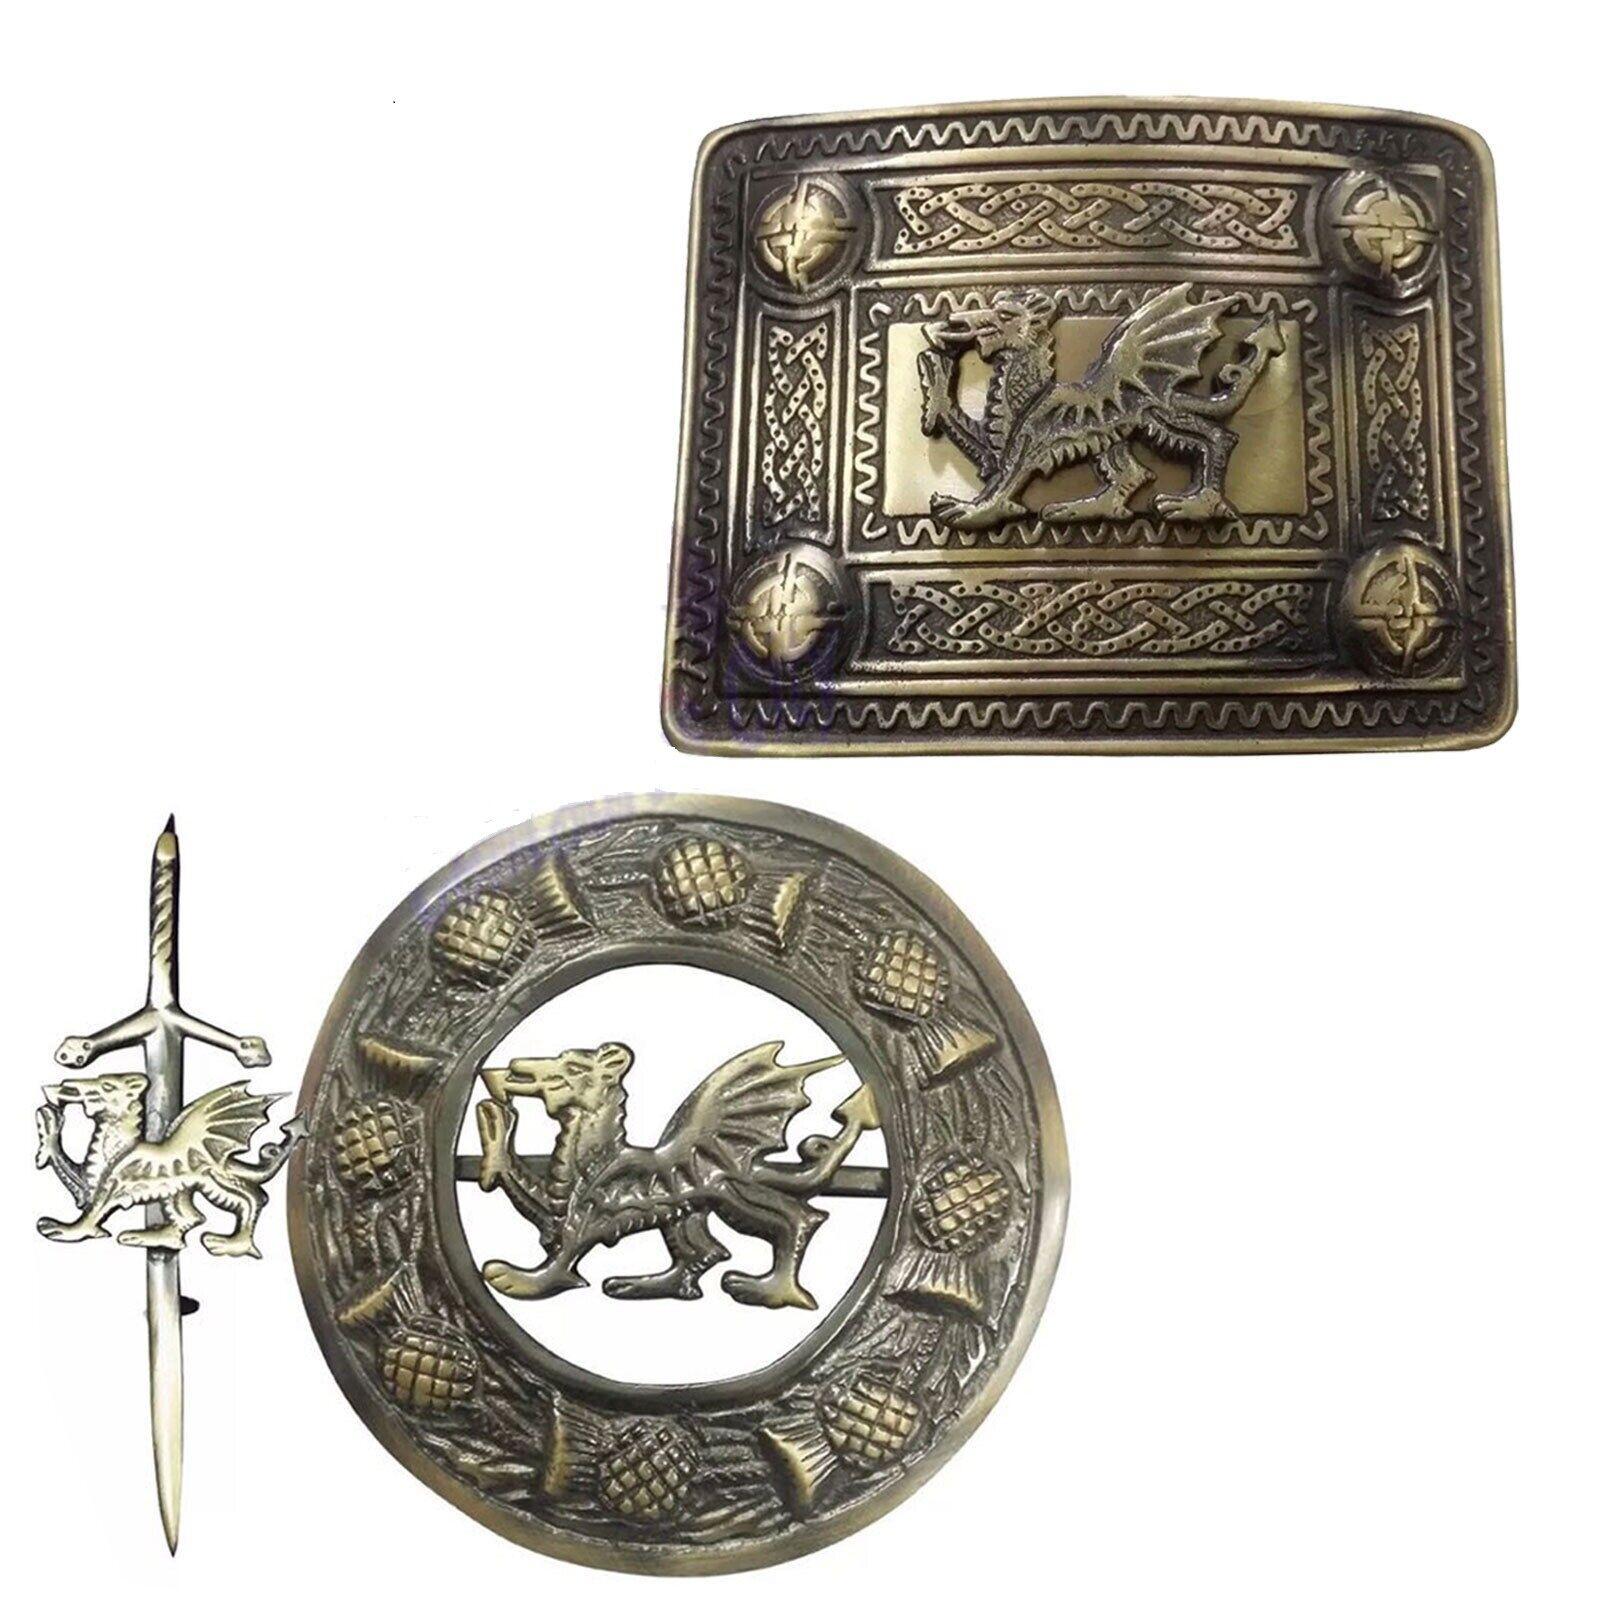 HS Kilt Belt Buckle Welsh Dragon Fly Plaid Brooch Kilt Pin Celtic Antique Finish